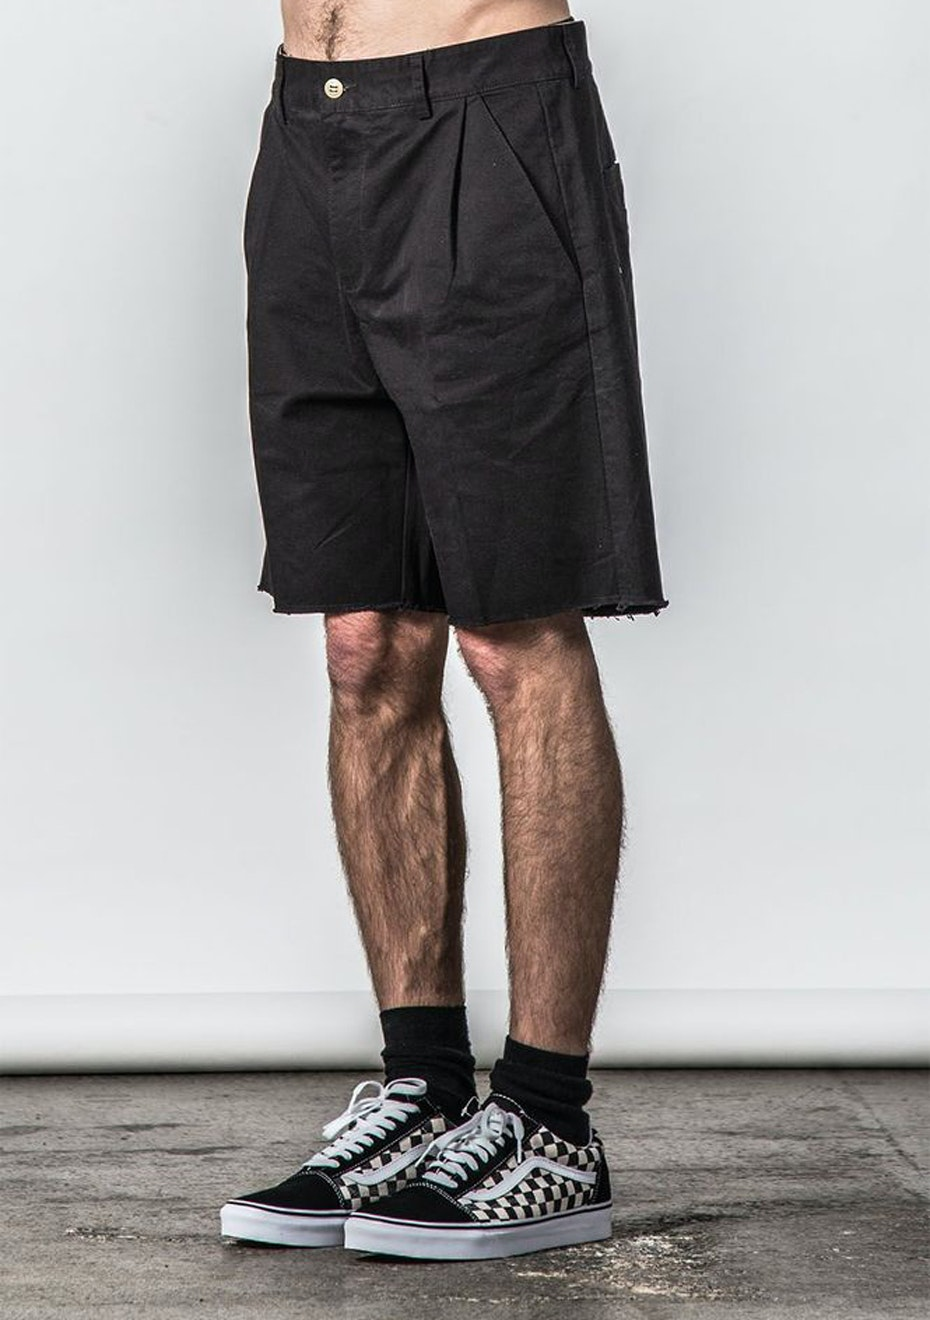 Thing Thing - Heist Short - Black